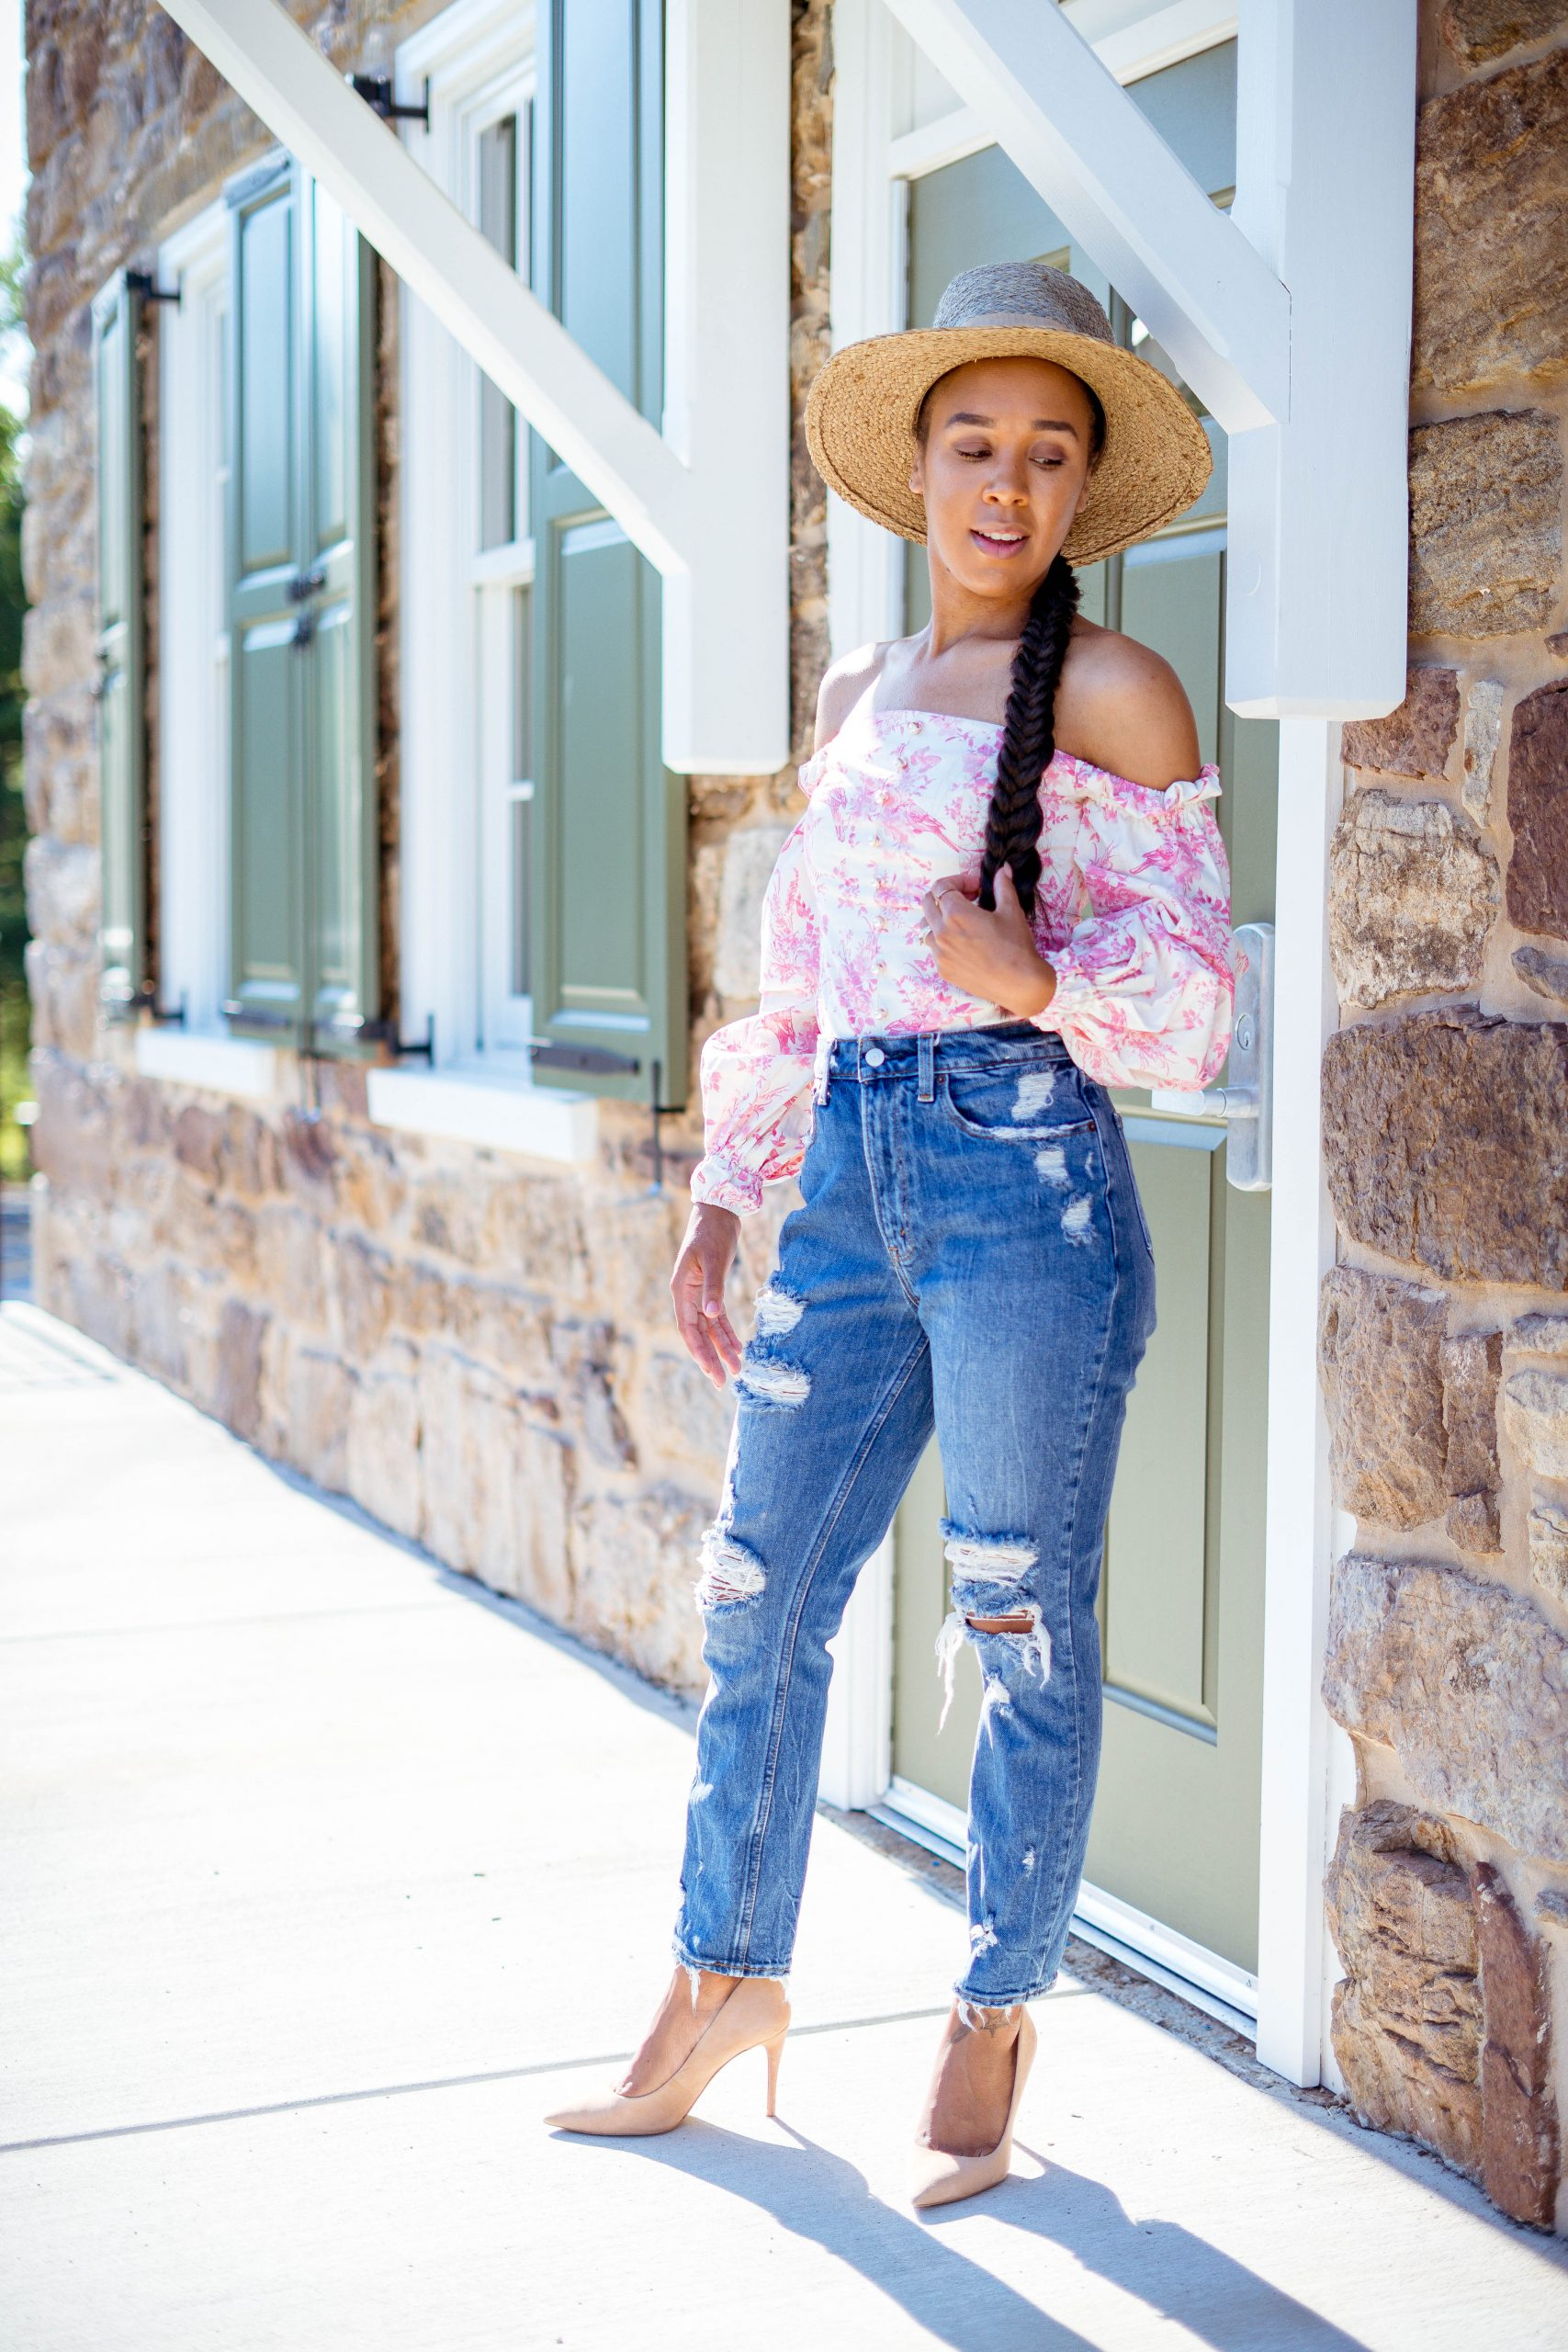 livinglesh sharing her favorite affordable online fashion boutiques